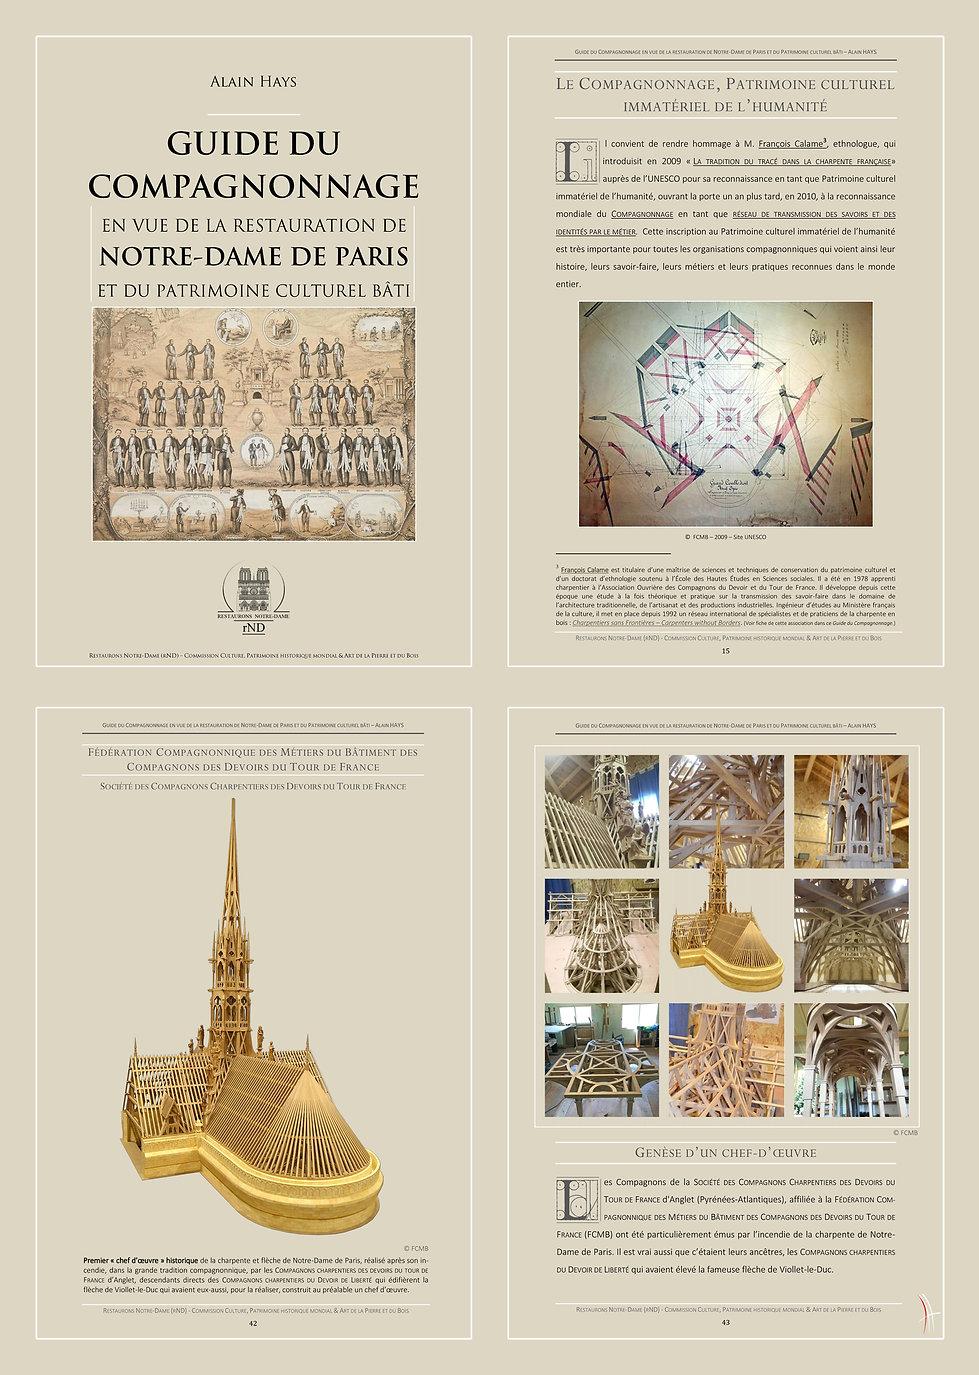 GUIDE DU COMPAGNONNAGE by Alain HAYS H 2